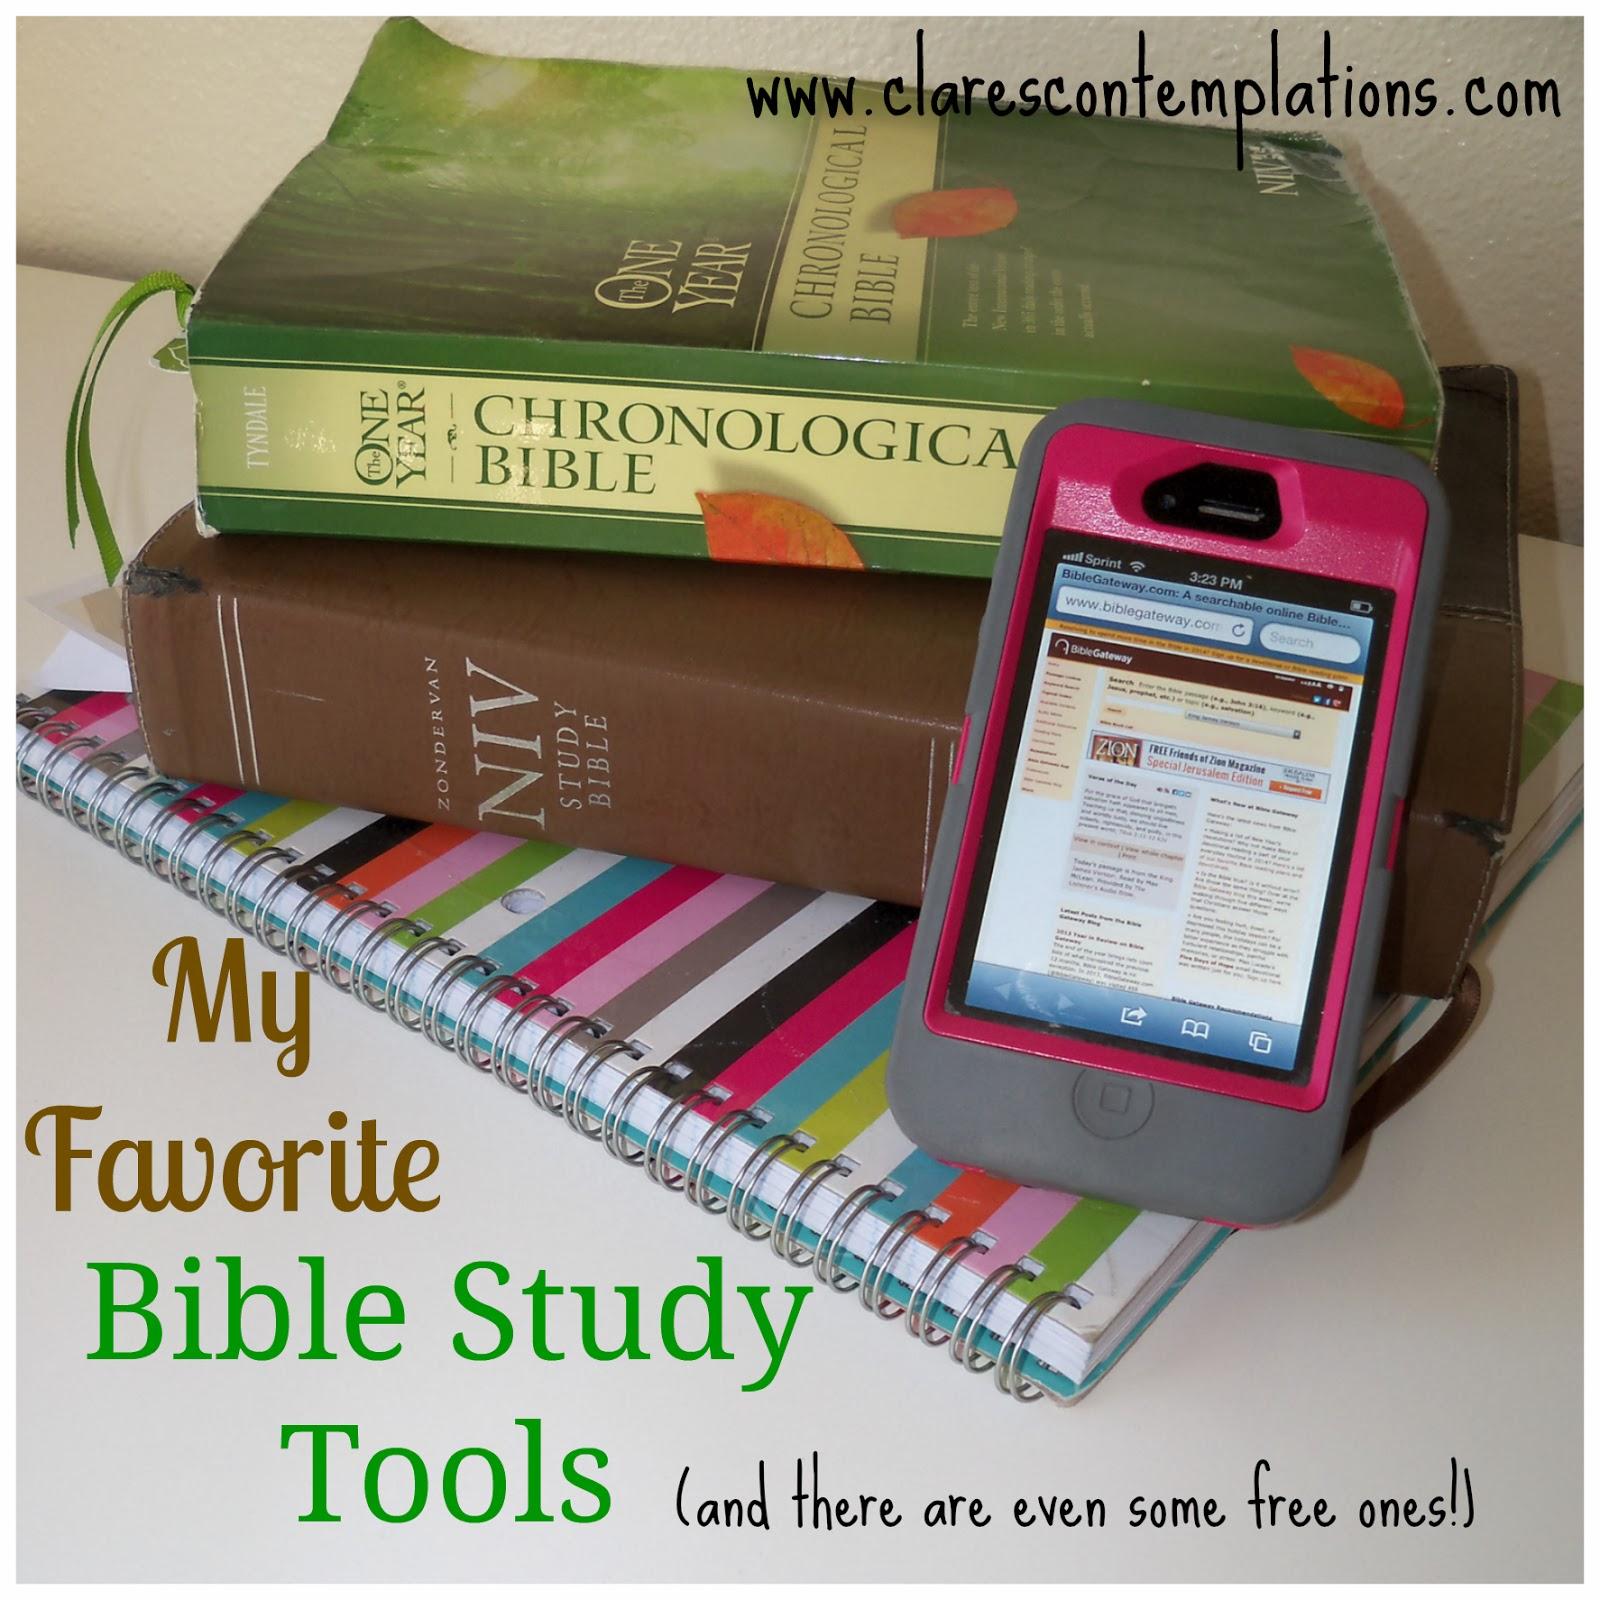 http://www.clarescontemplations.com/2014/01/my-favorite-bible-study-tools.html